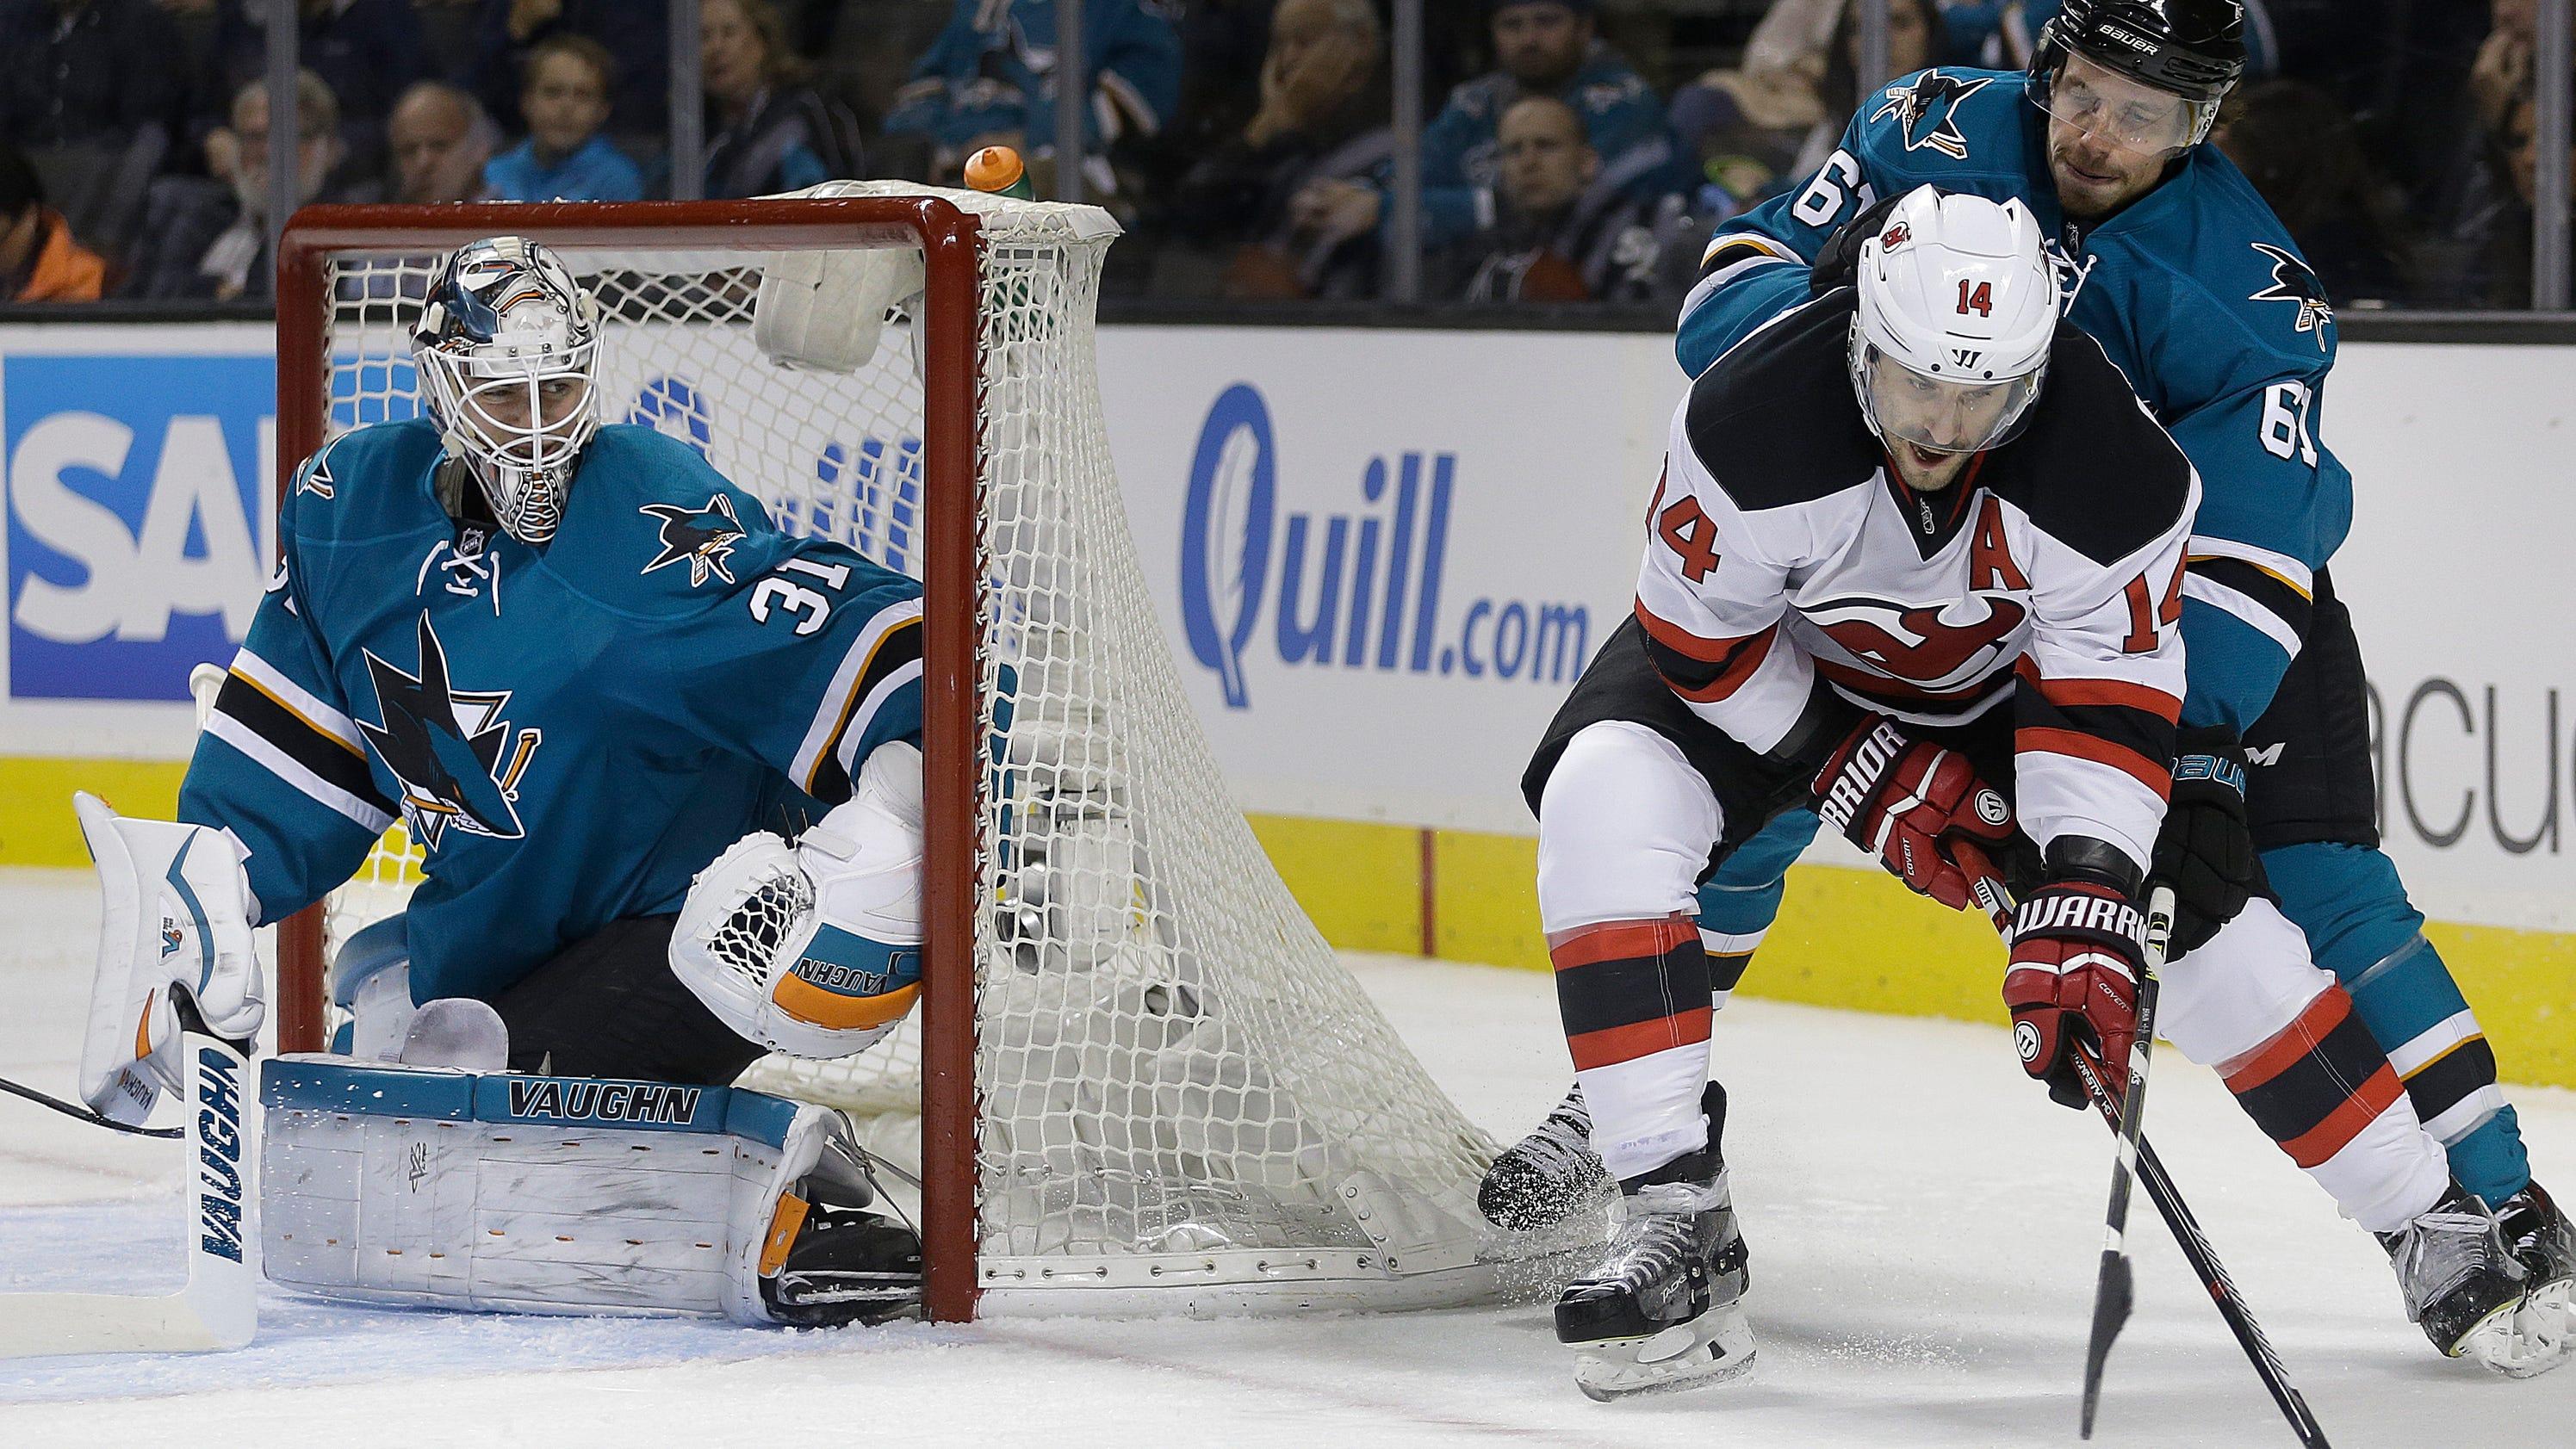 Jones, early goals help Sharks beat Devils 4-0